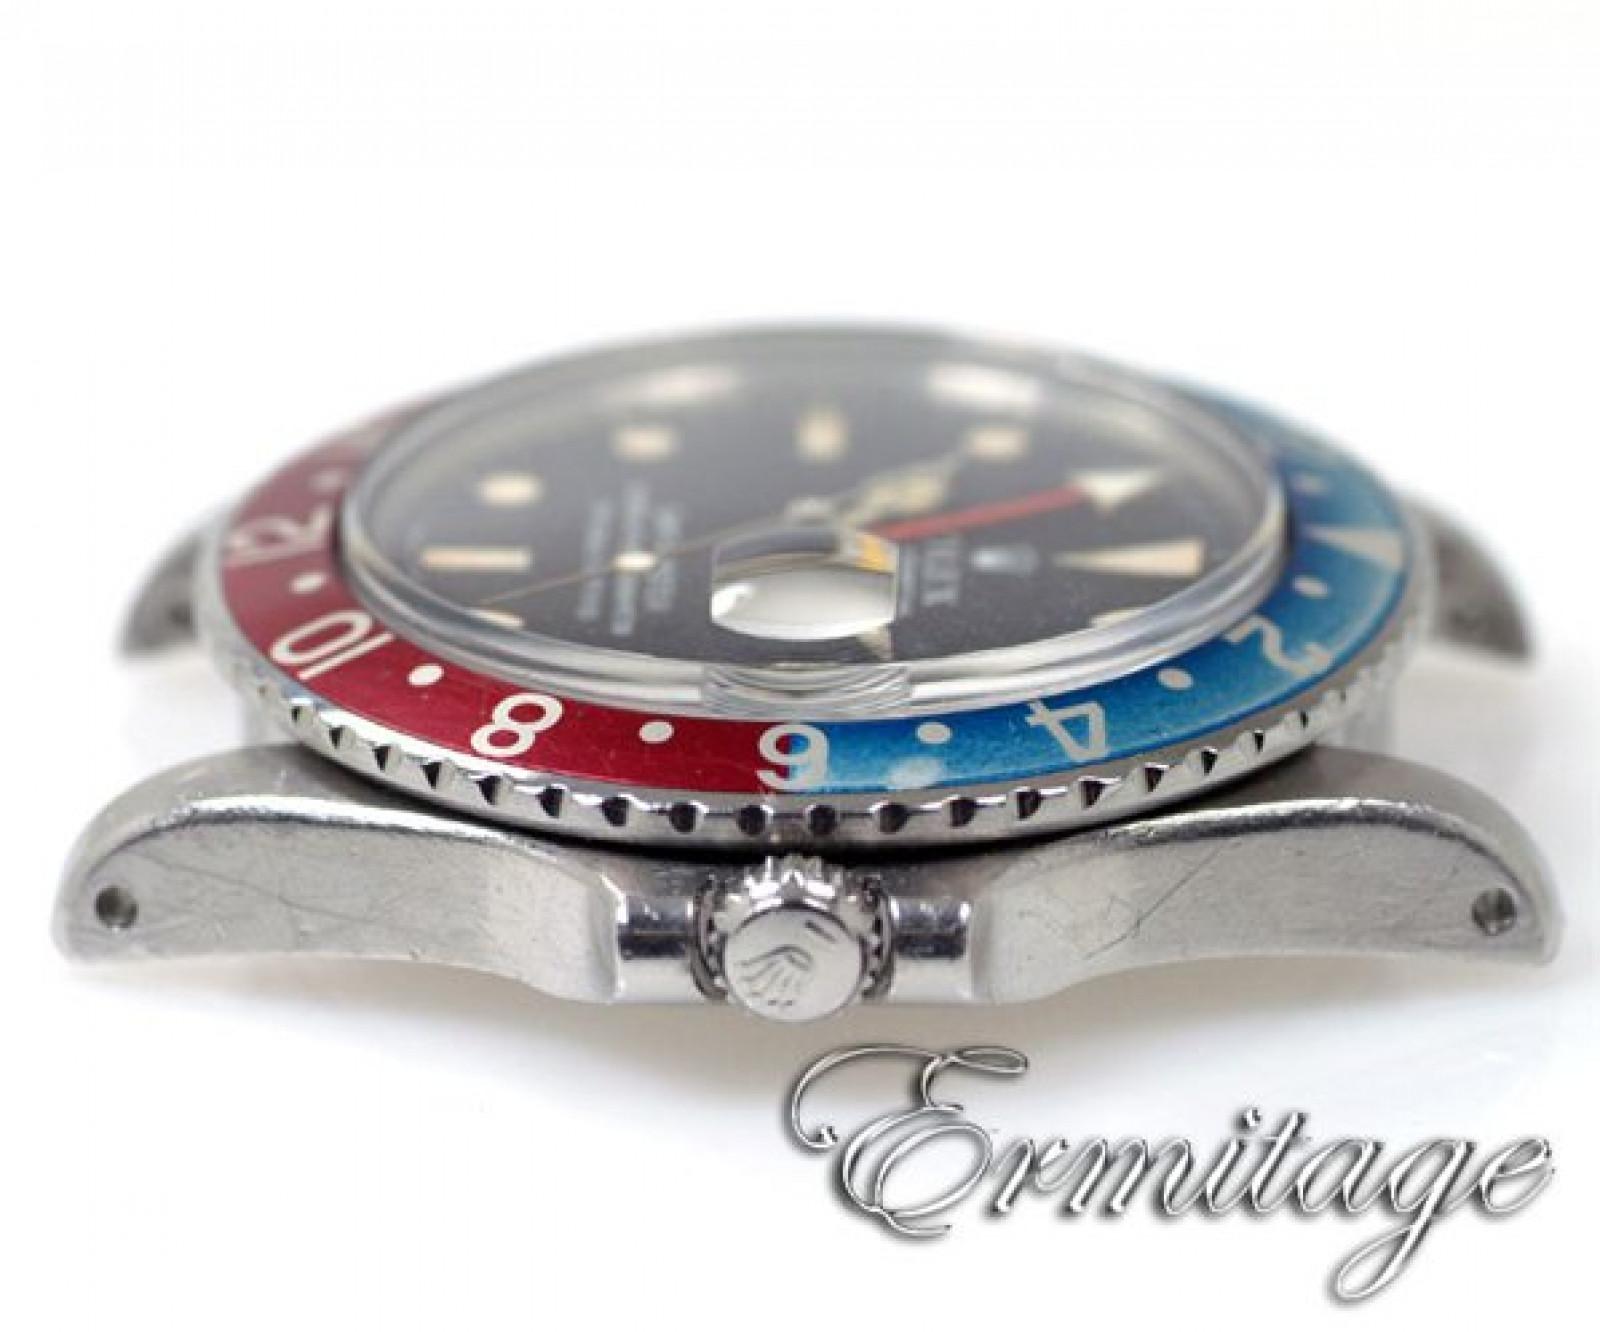 Vintage Pepsi Style Vintage Rolex GMT-Master 1675 Steel Year 1970